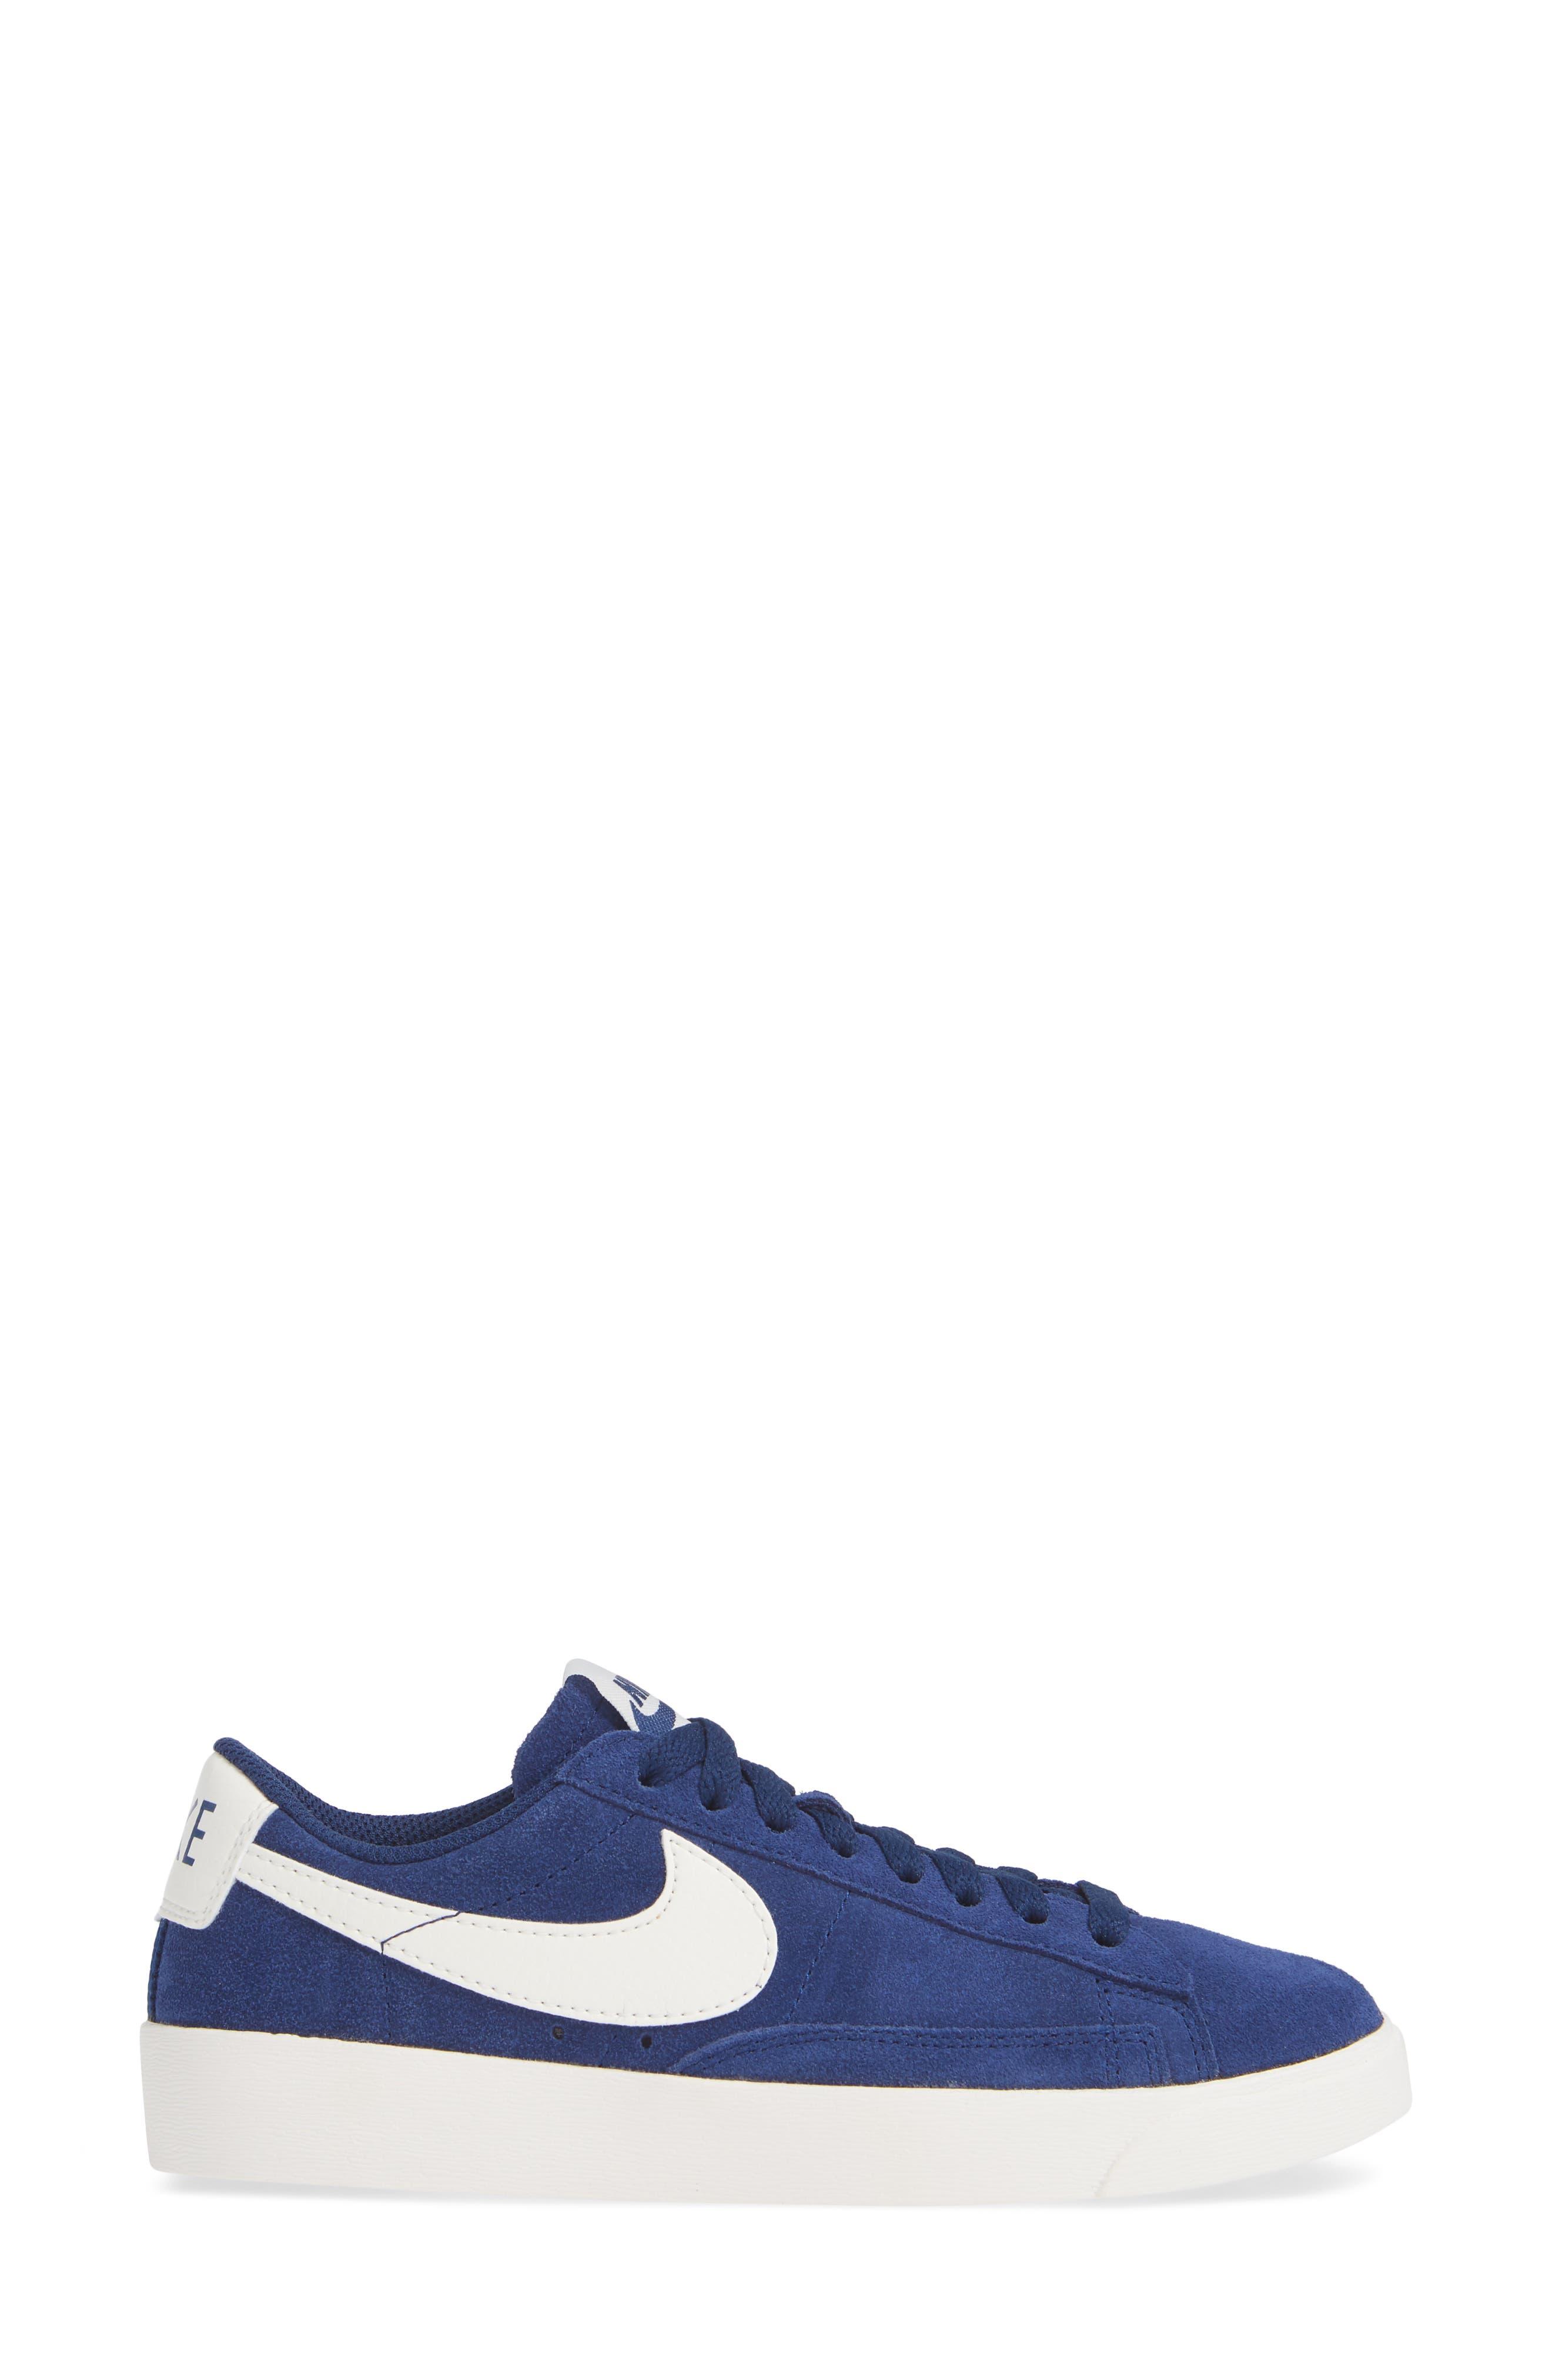 Blazer Low Sneaker,                             Alternate thumbnail 3, color,                             402